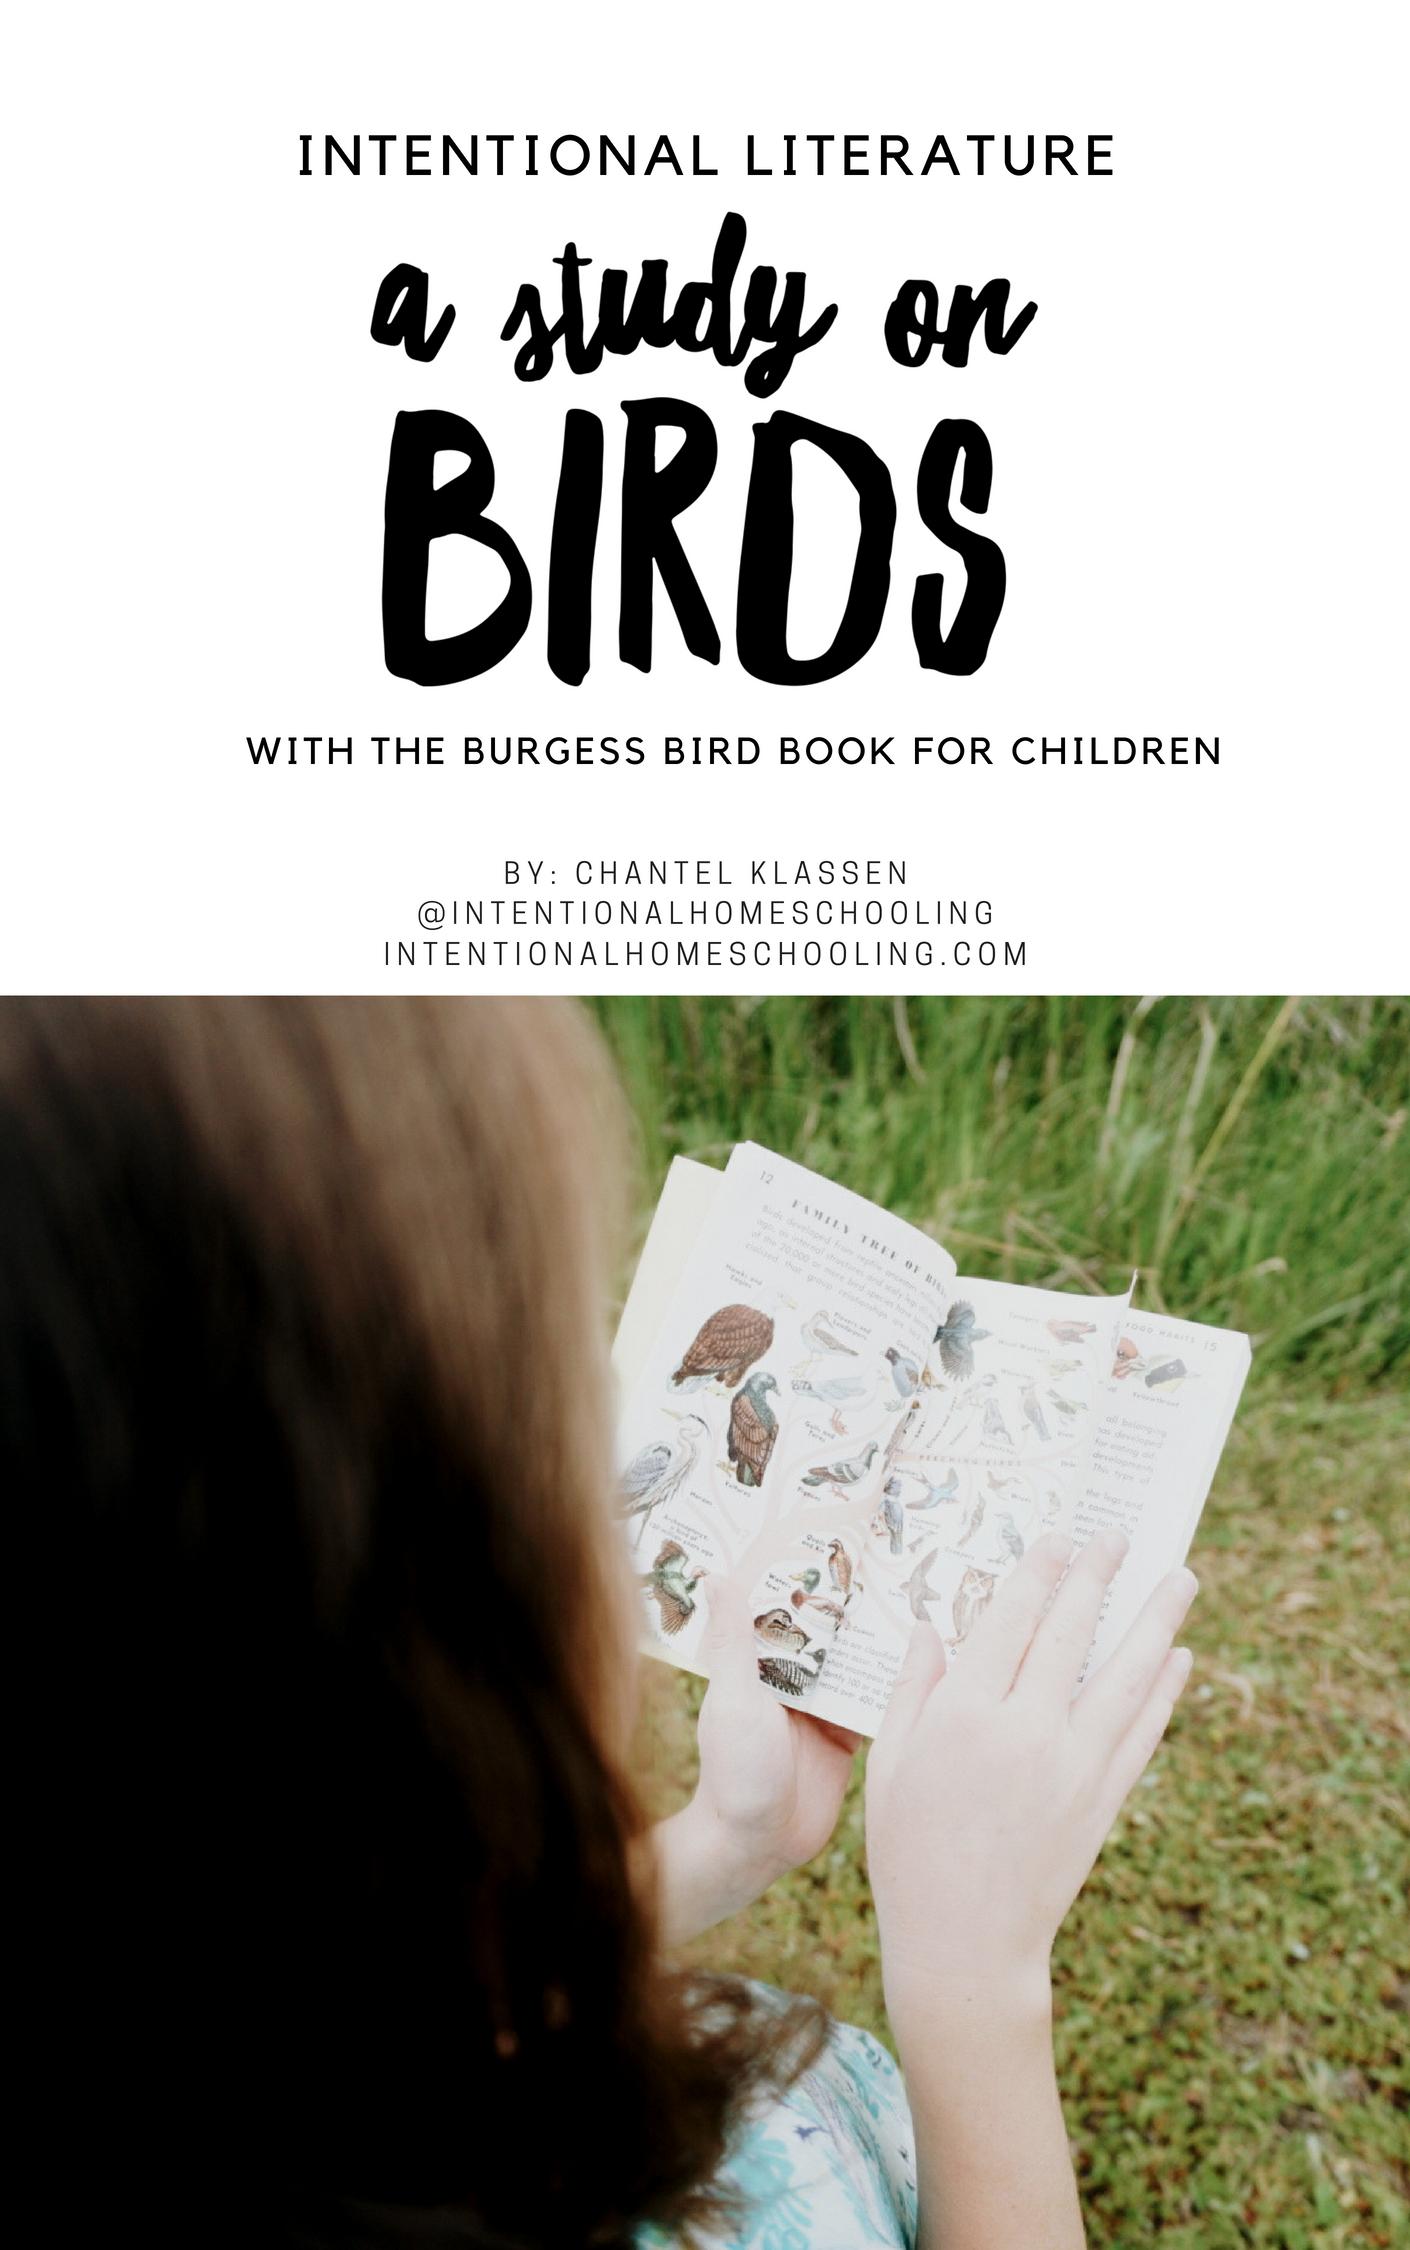 Bird Literature Guide - a literature unit study on birds using The Burgess Bird Book for Children